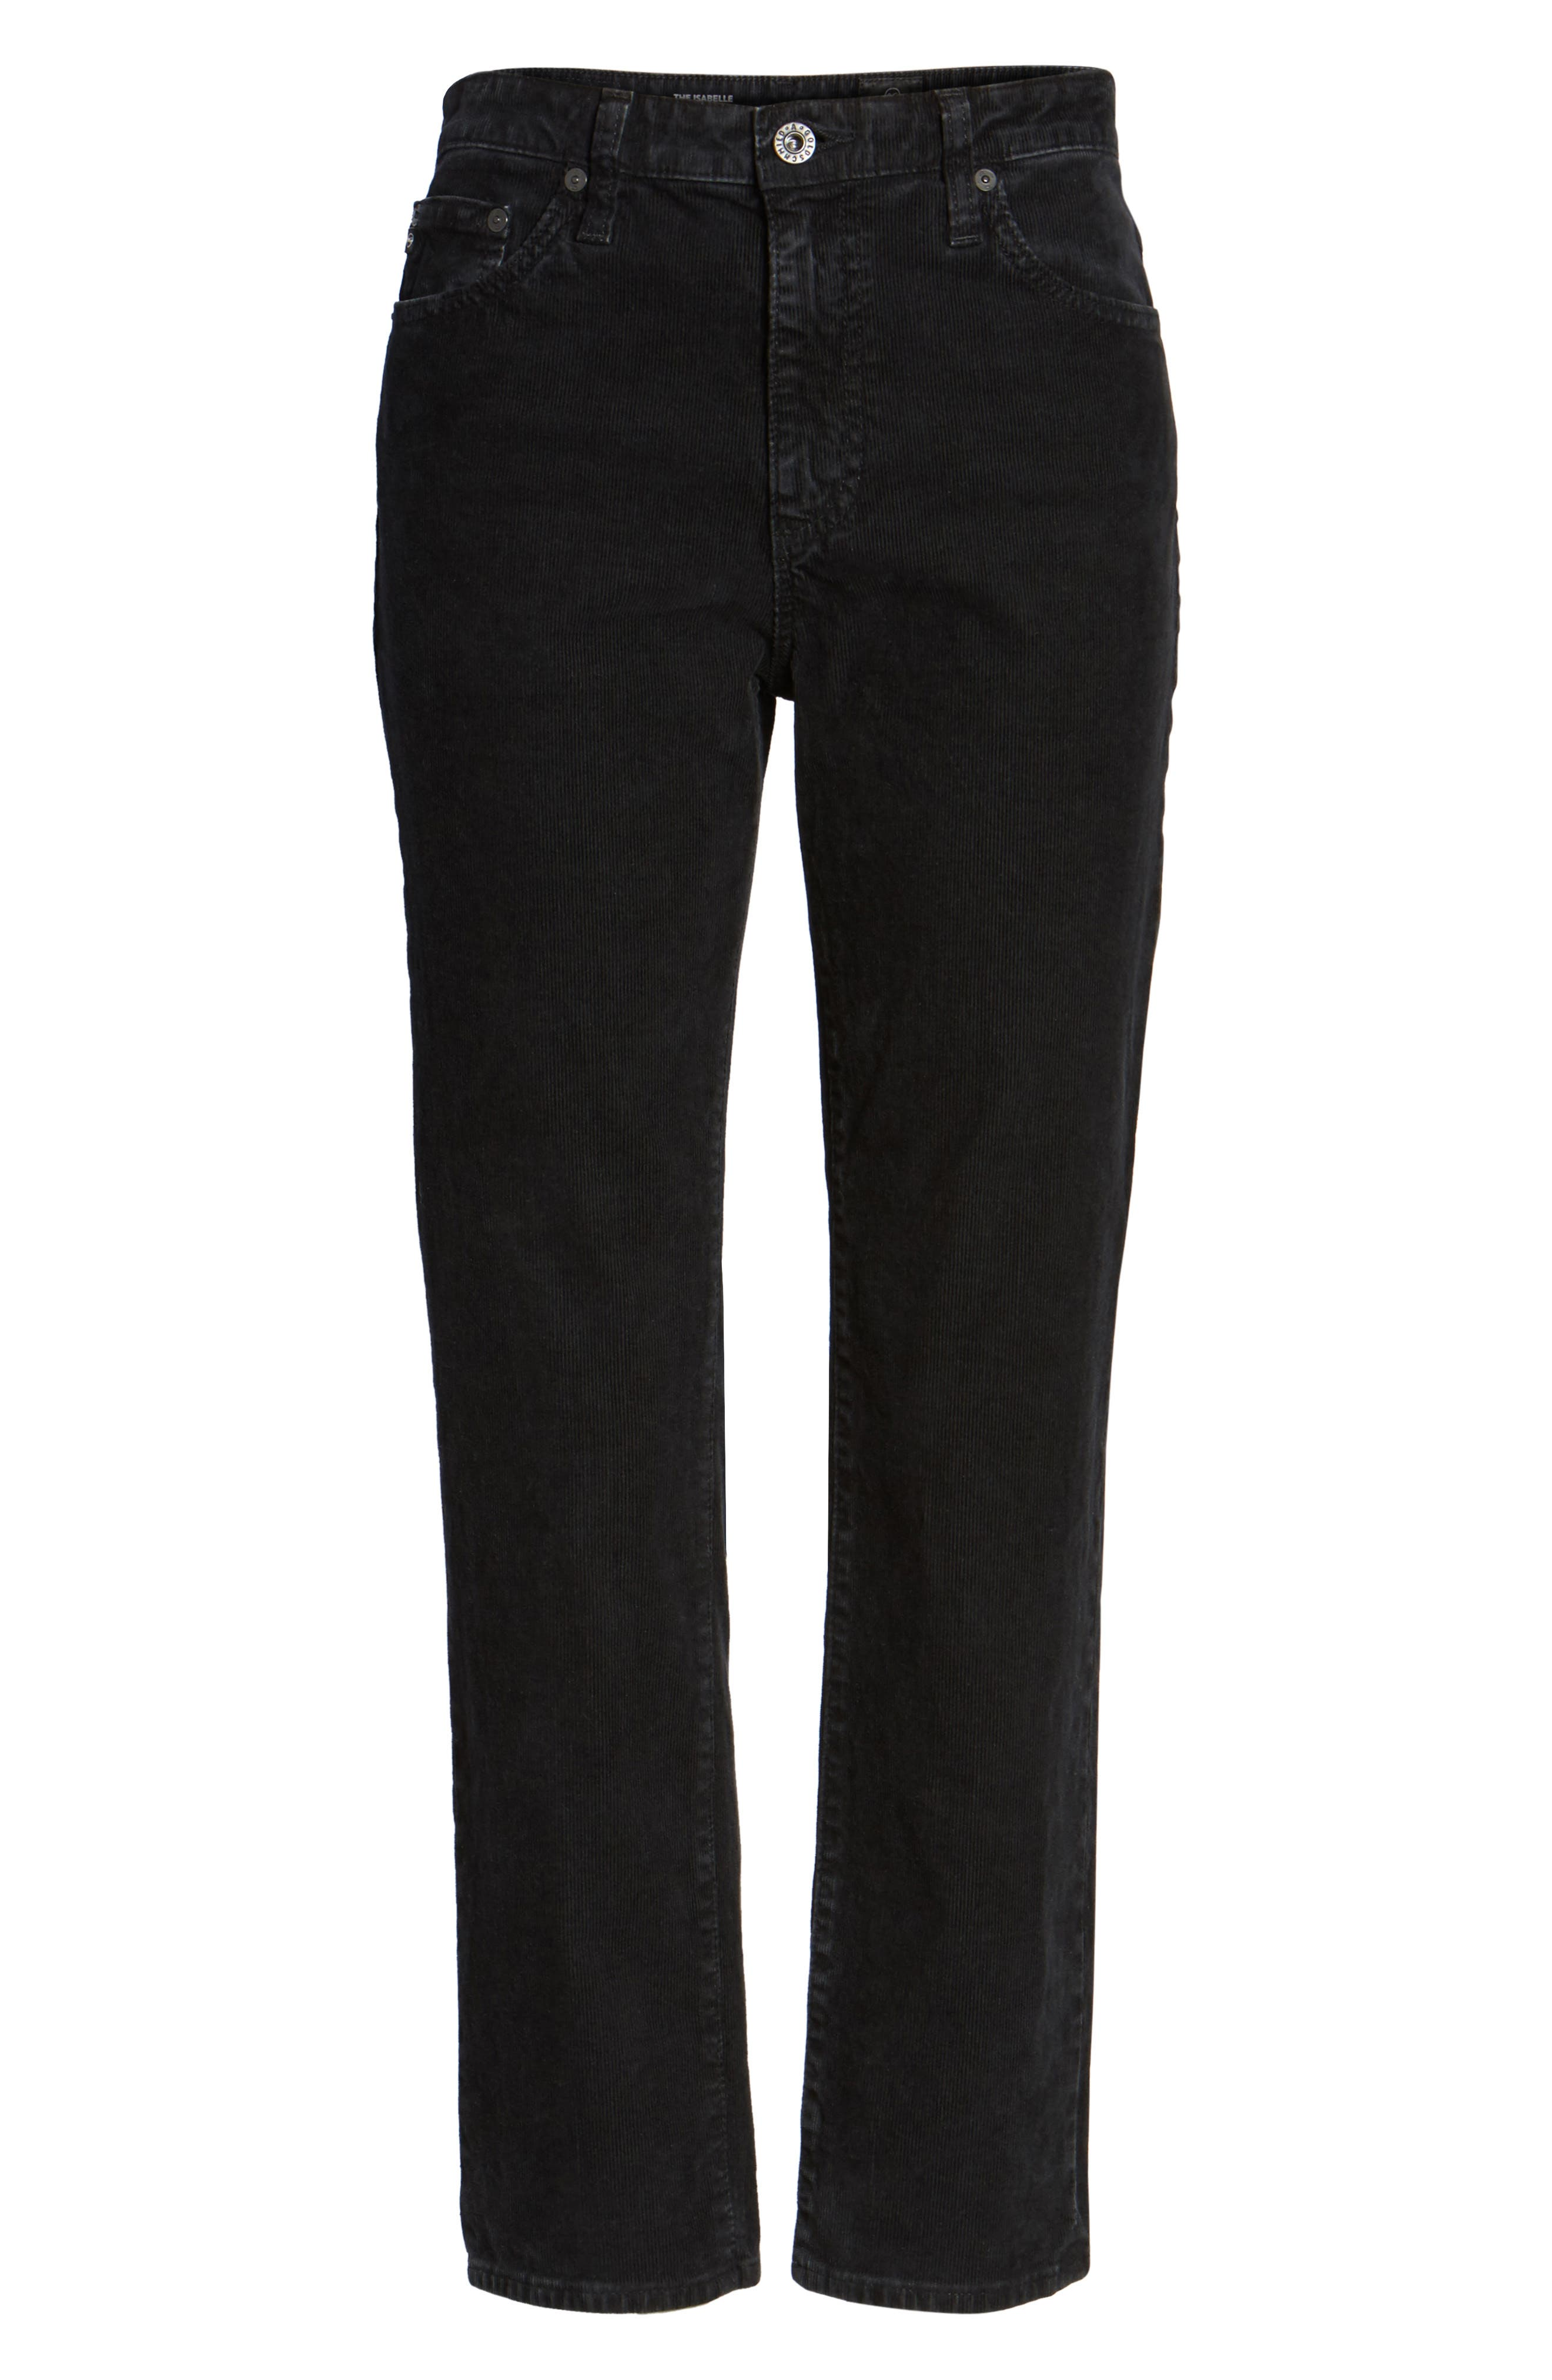 Isabelle High Waist Corduroy Jeans,                             Alternate thumbnail 6, color,